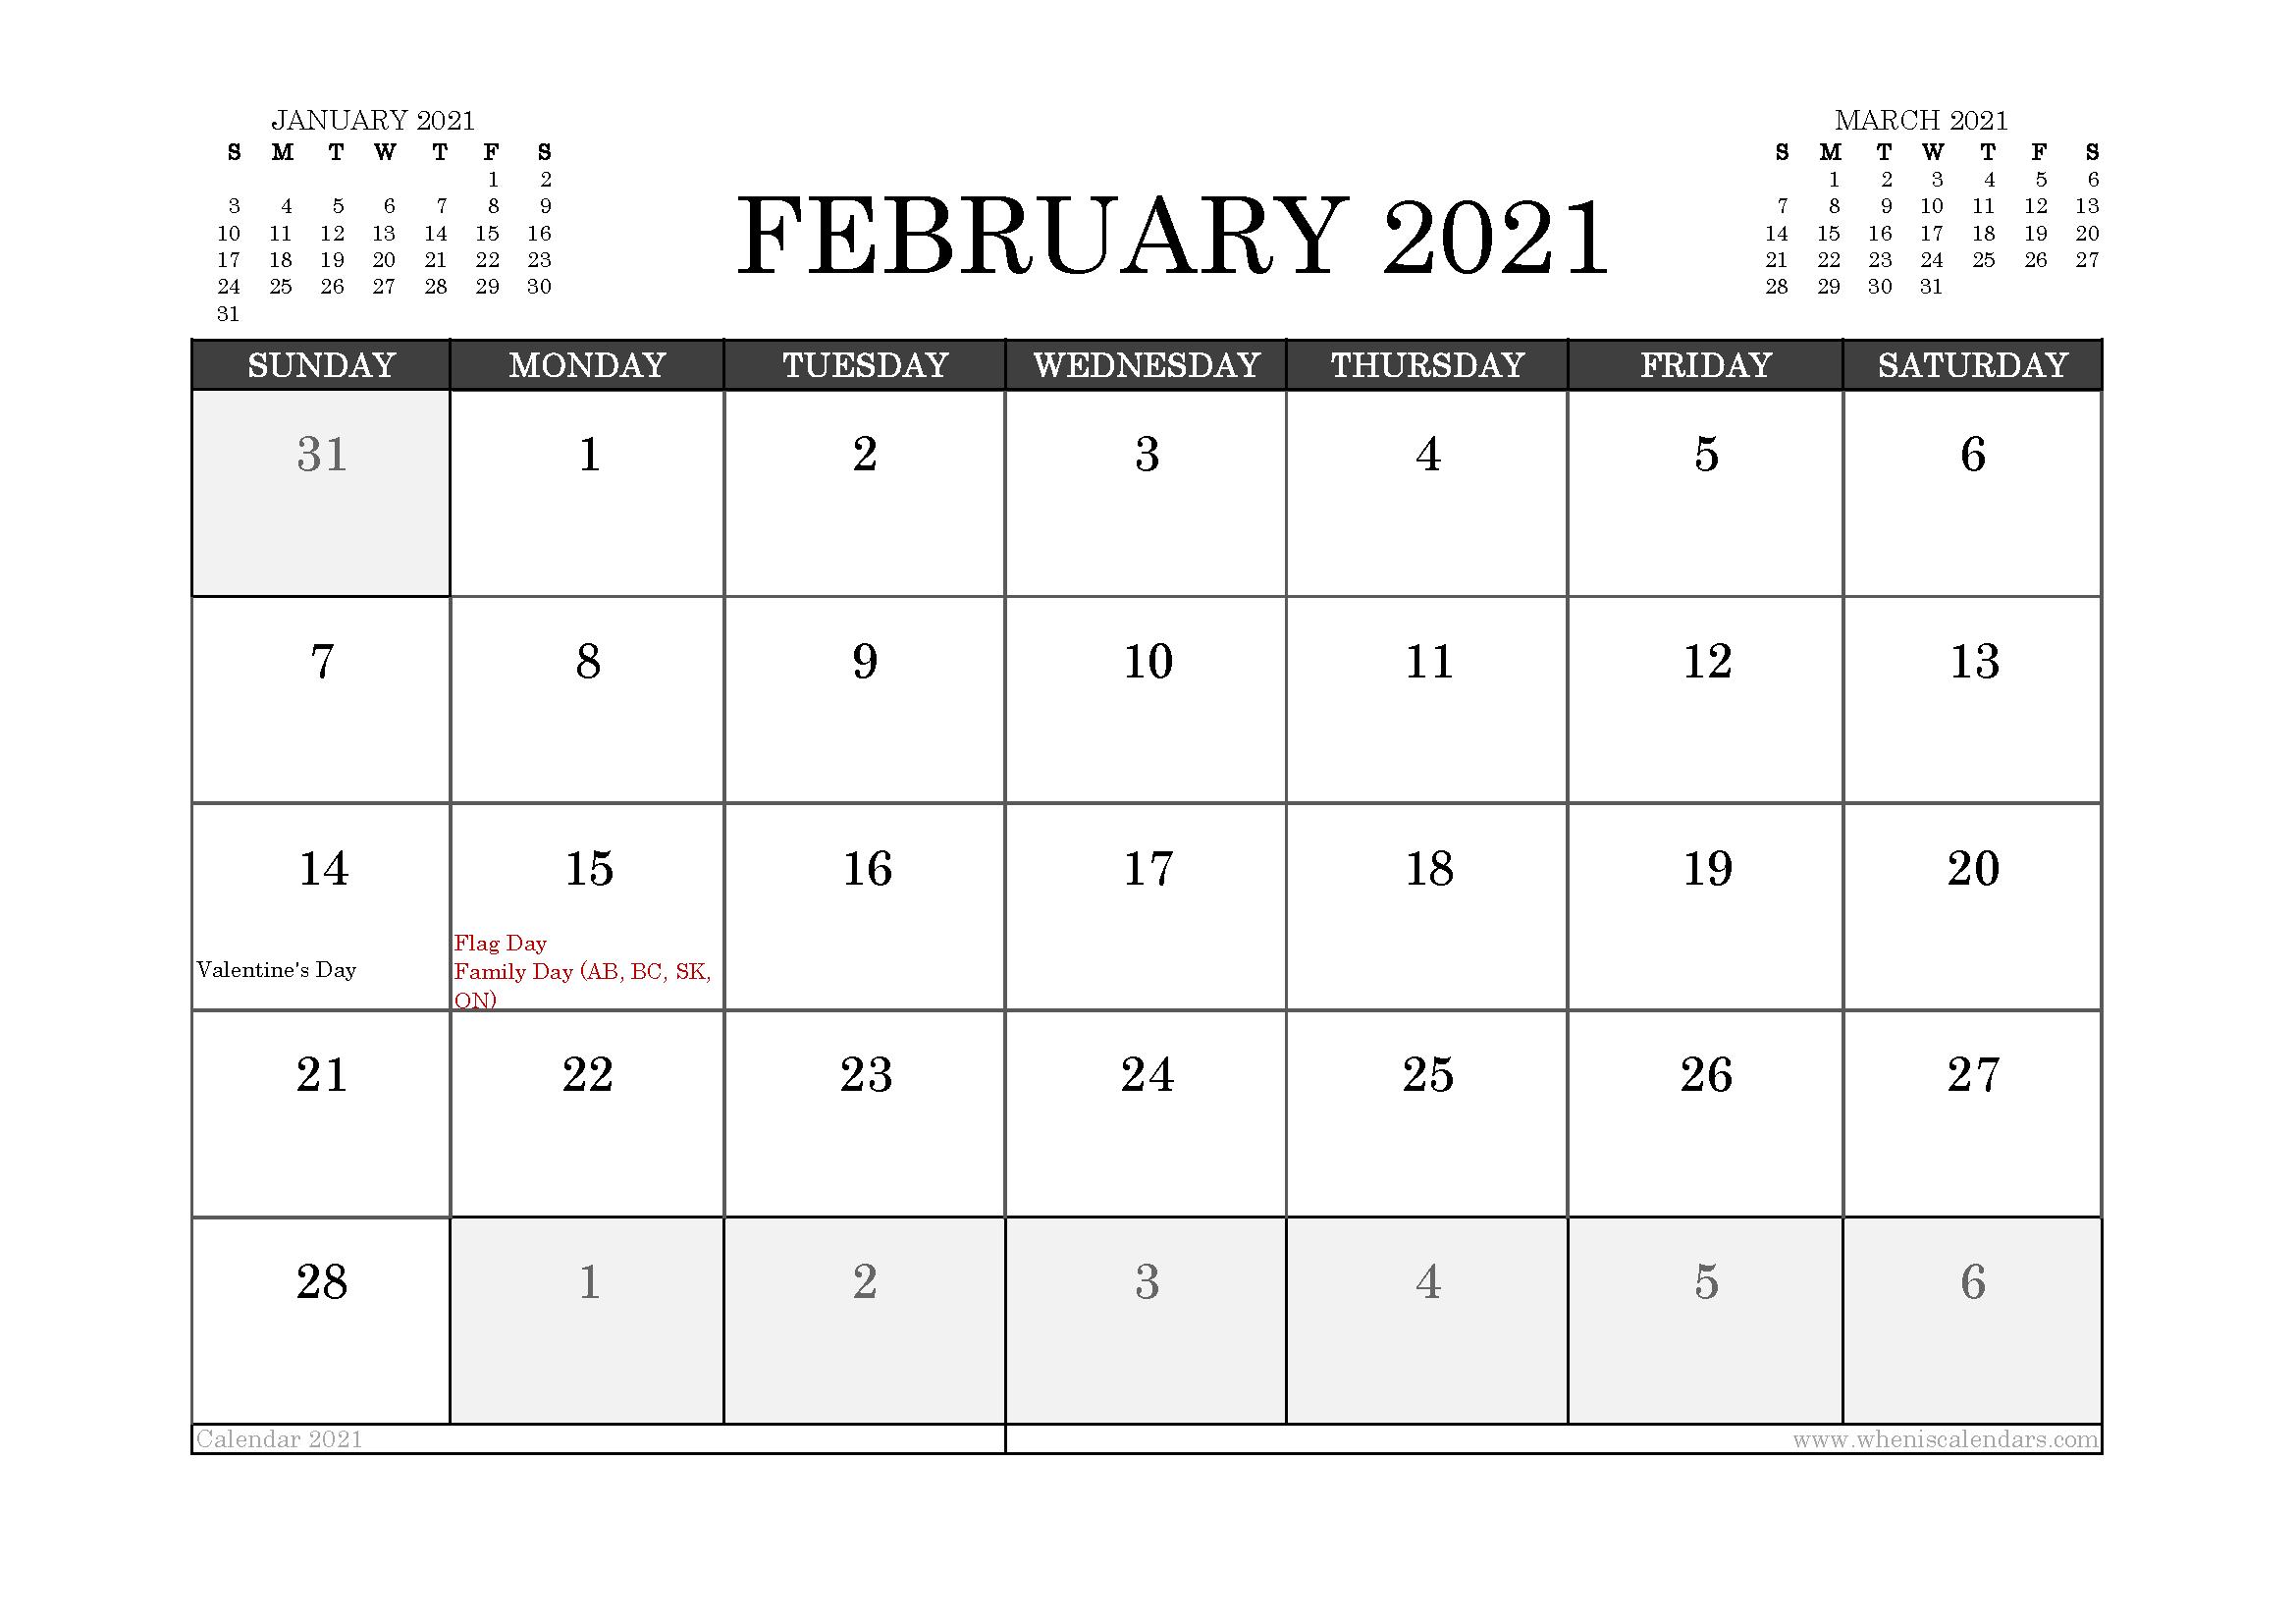 February 2021 Calendar Canada with Holidays